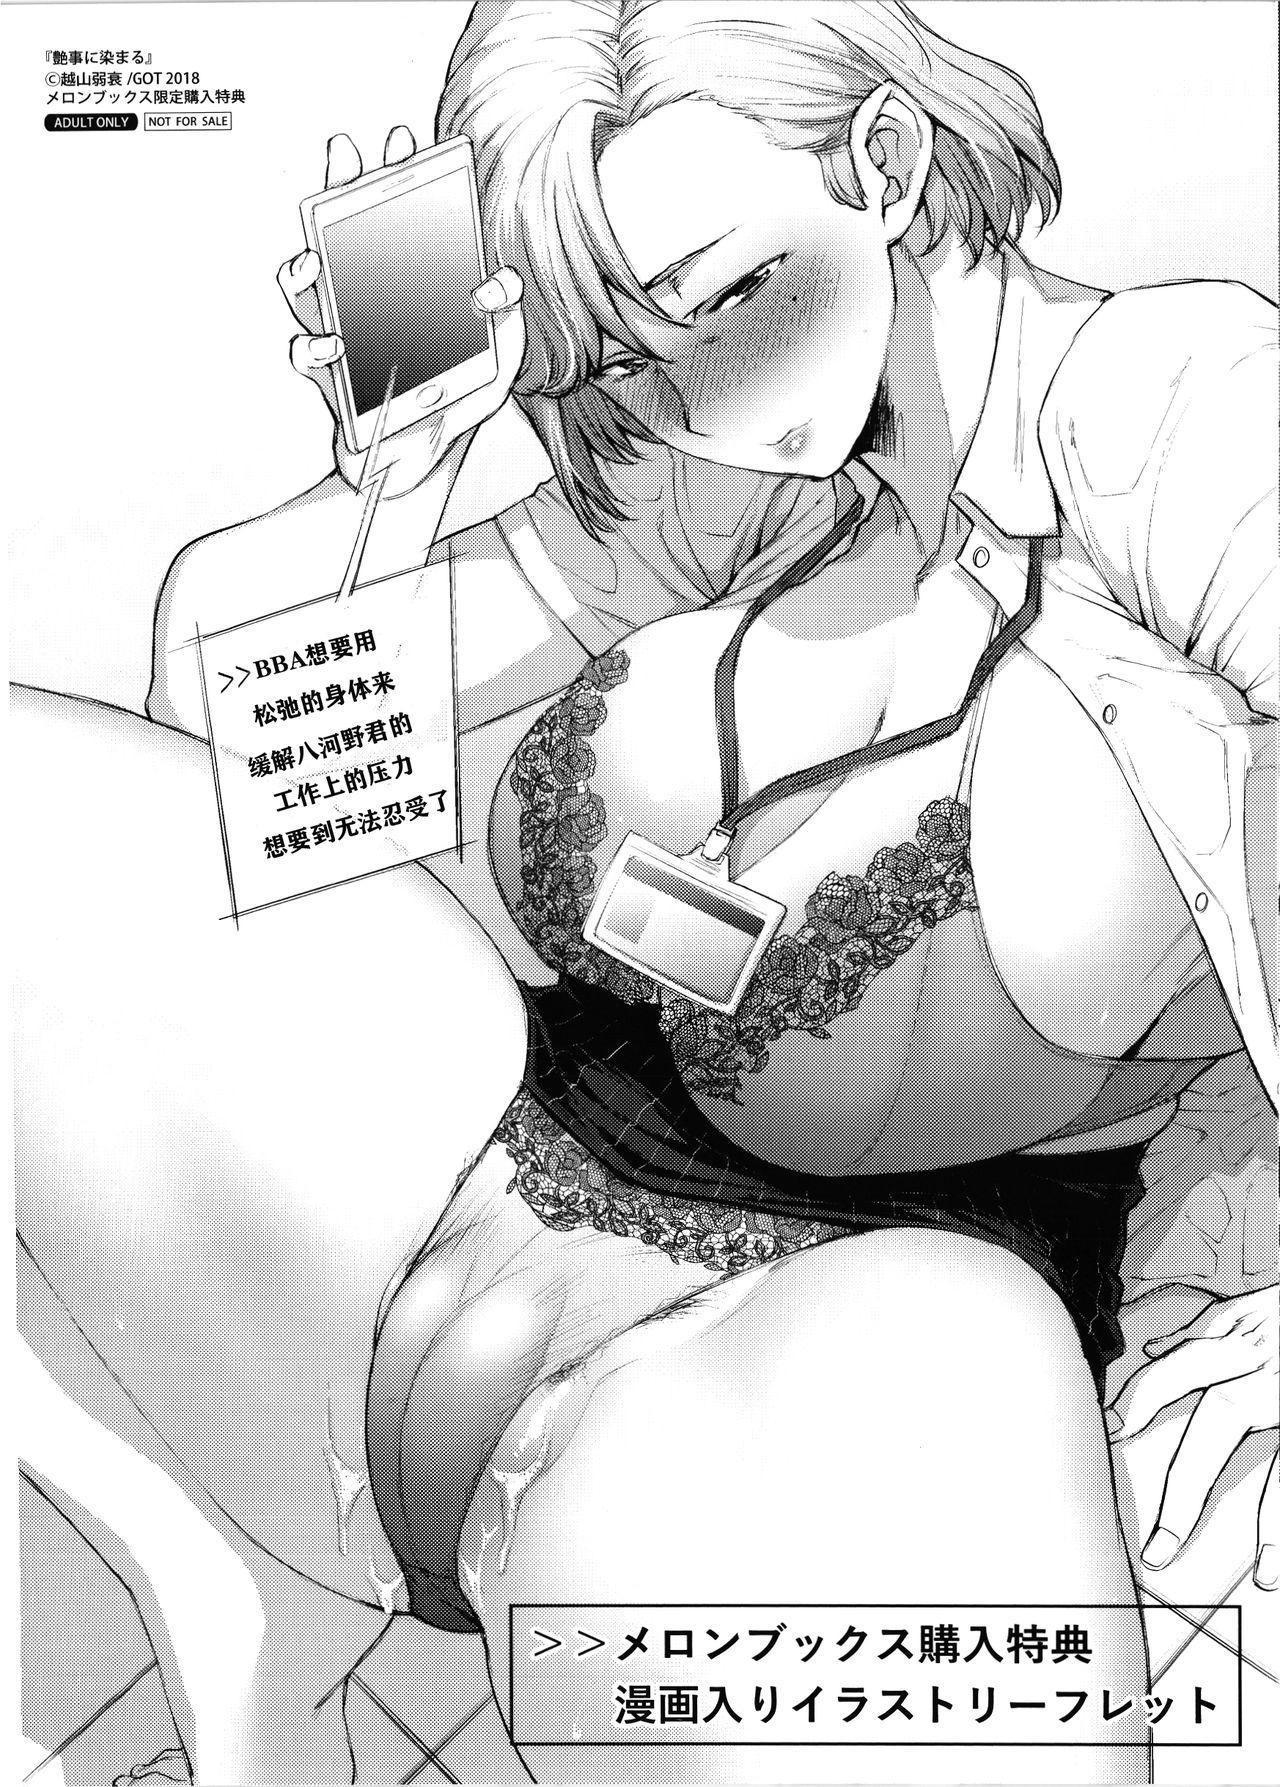 Milf hentai manga Tag: Milf